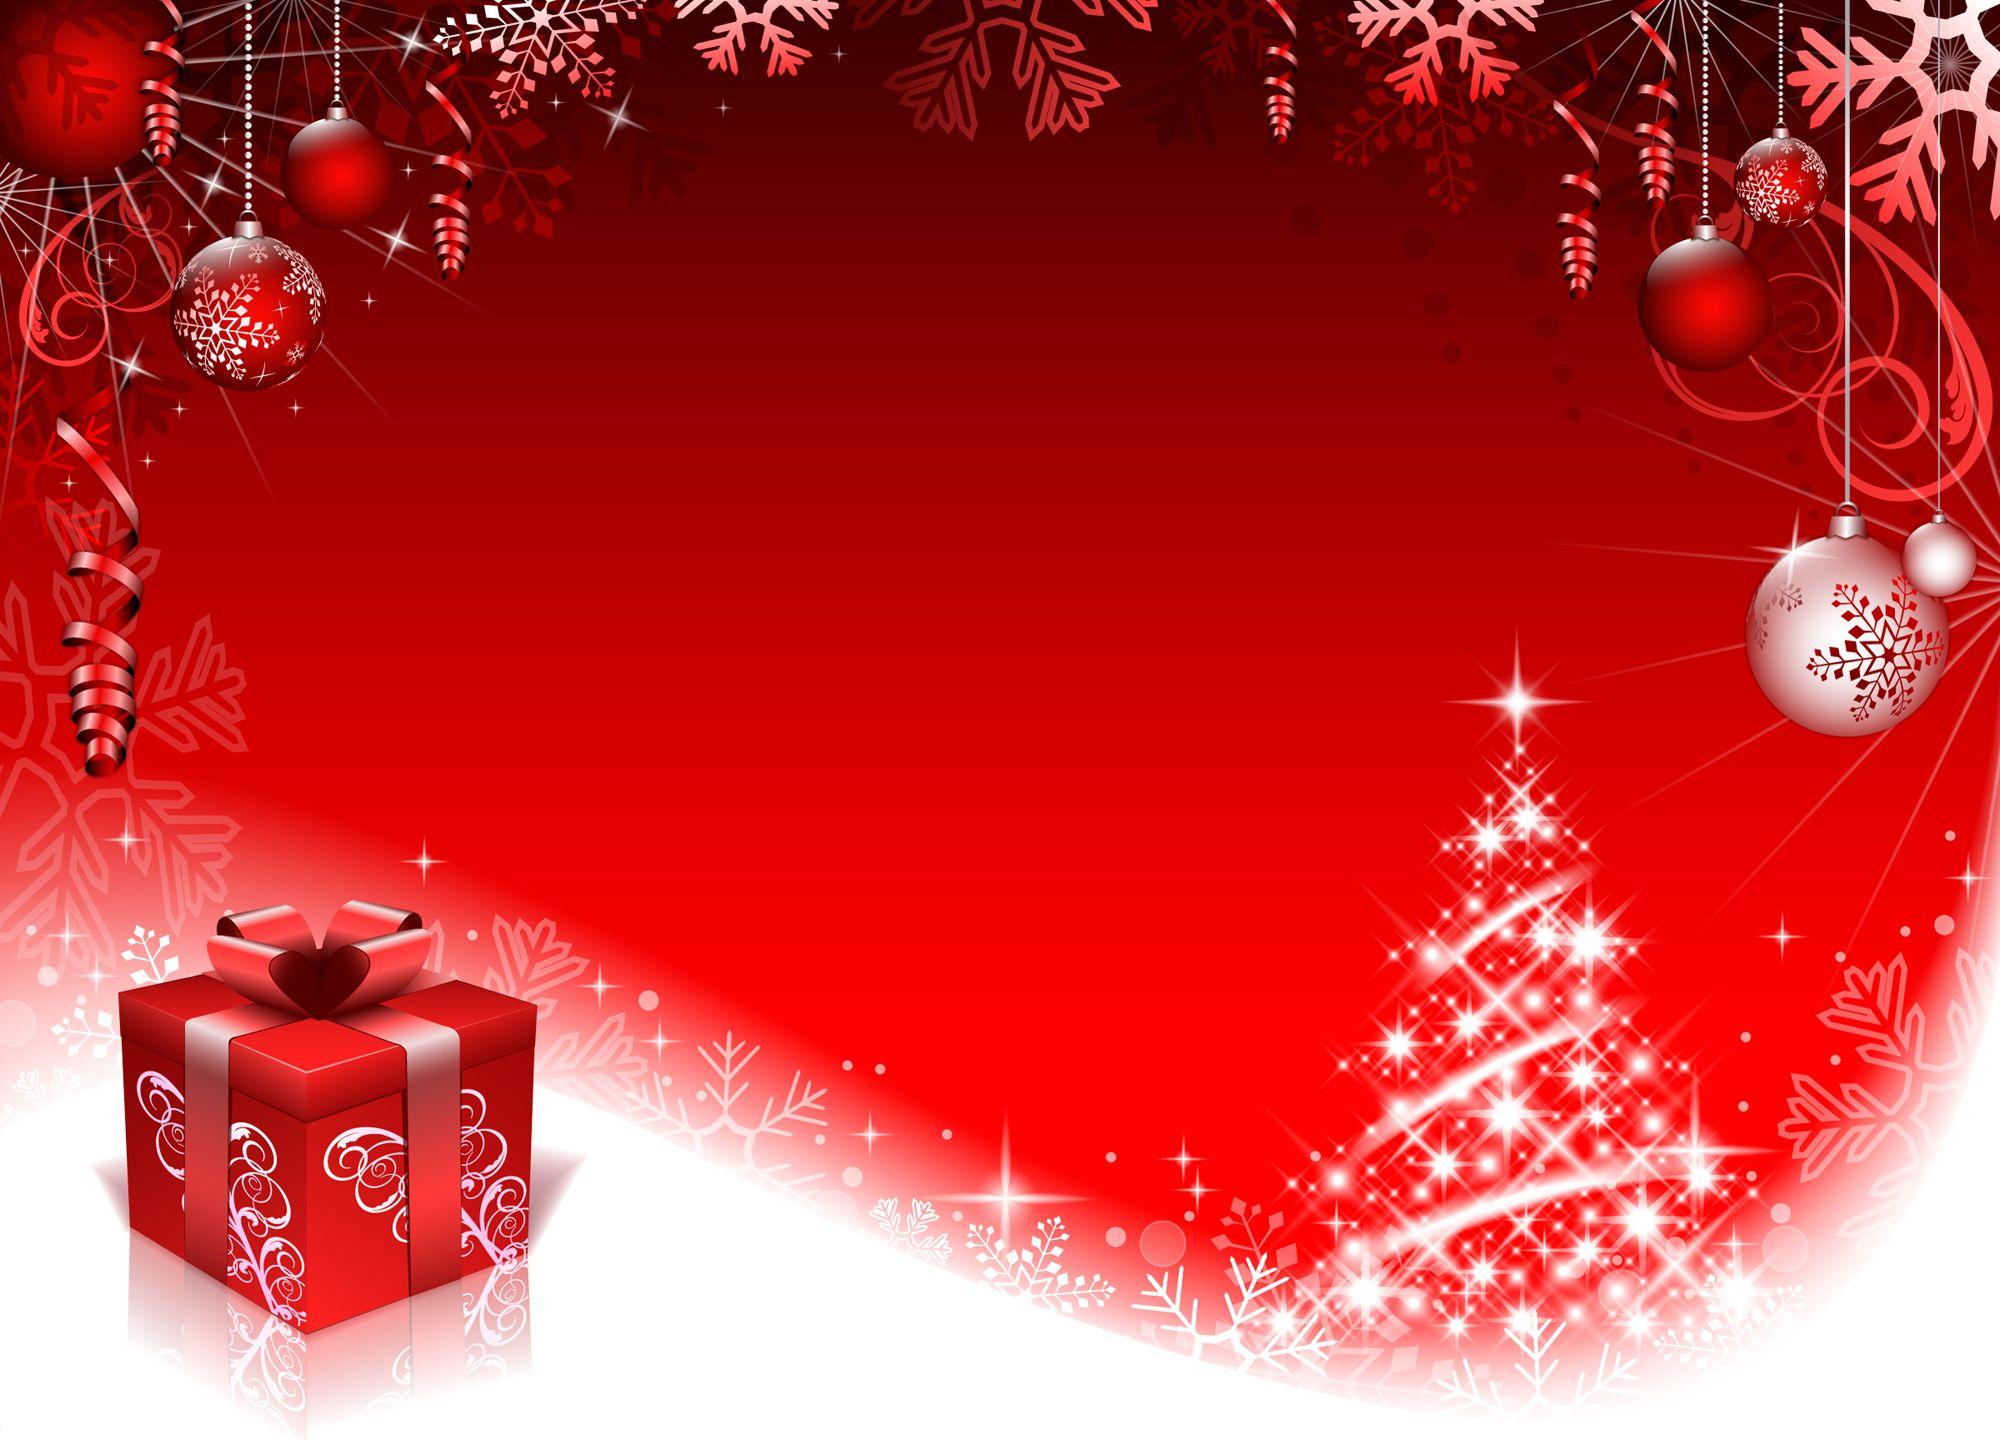 Christmas Backgrounds Christmas Backgrounds For